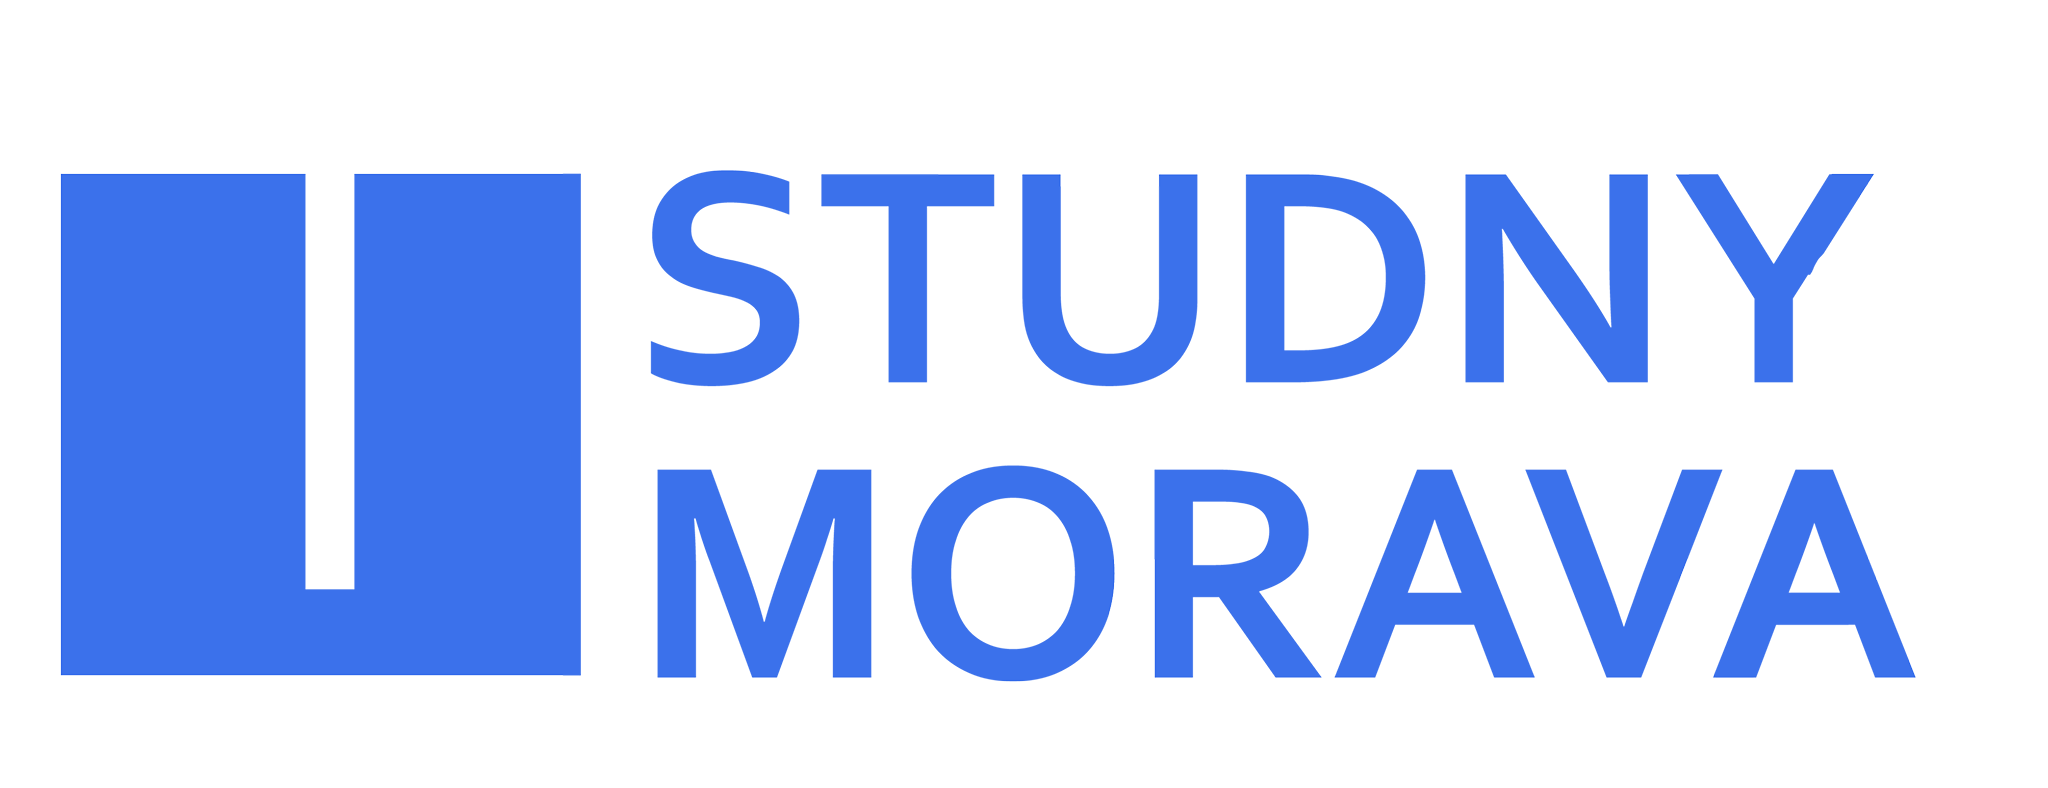 Studny-Morava